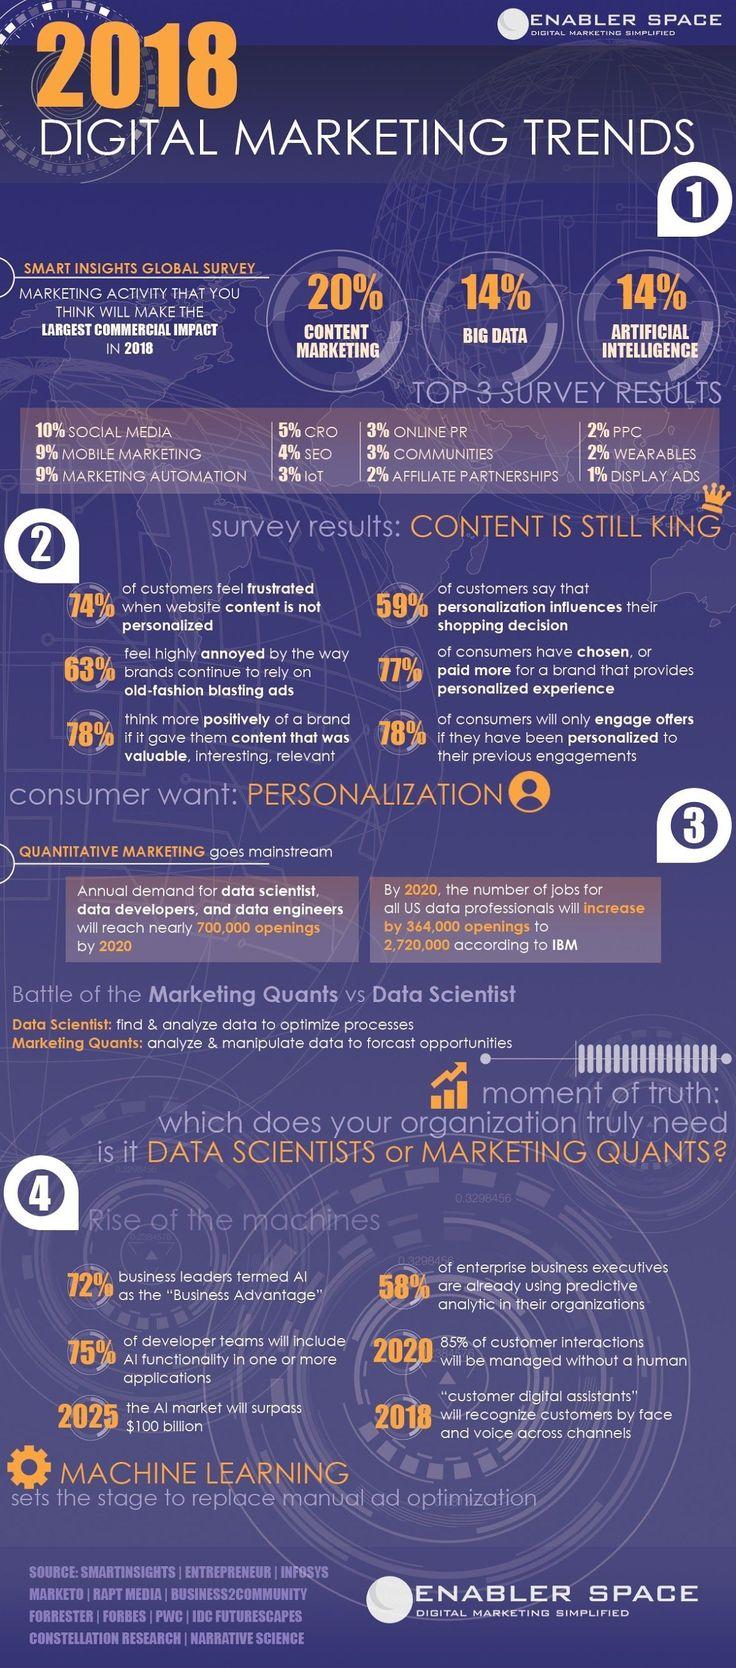 2018 Digital Marketing Trends and Statistics #digitalmarketing #strategy #2018 #socialmediamarketing